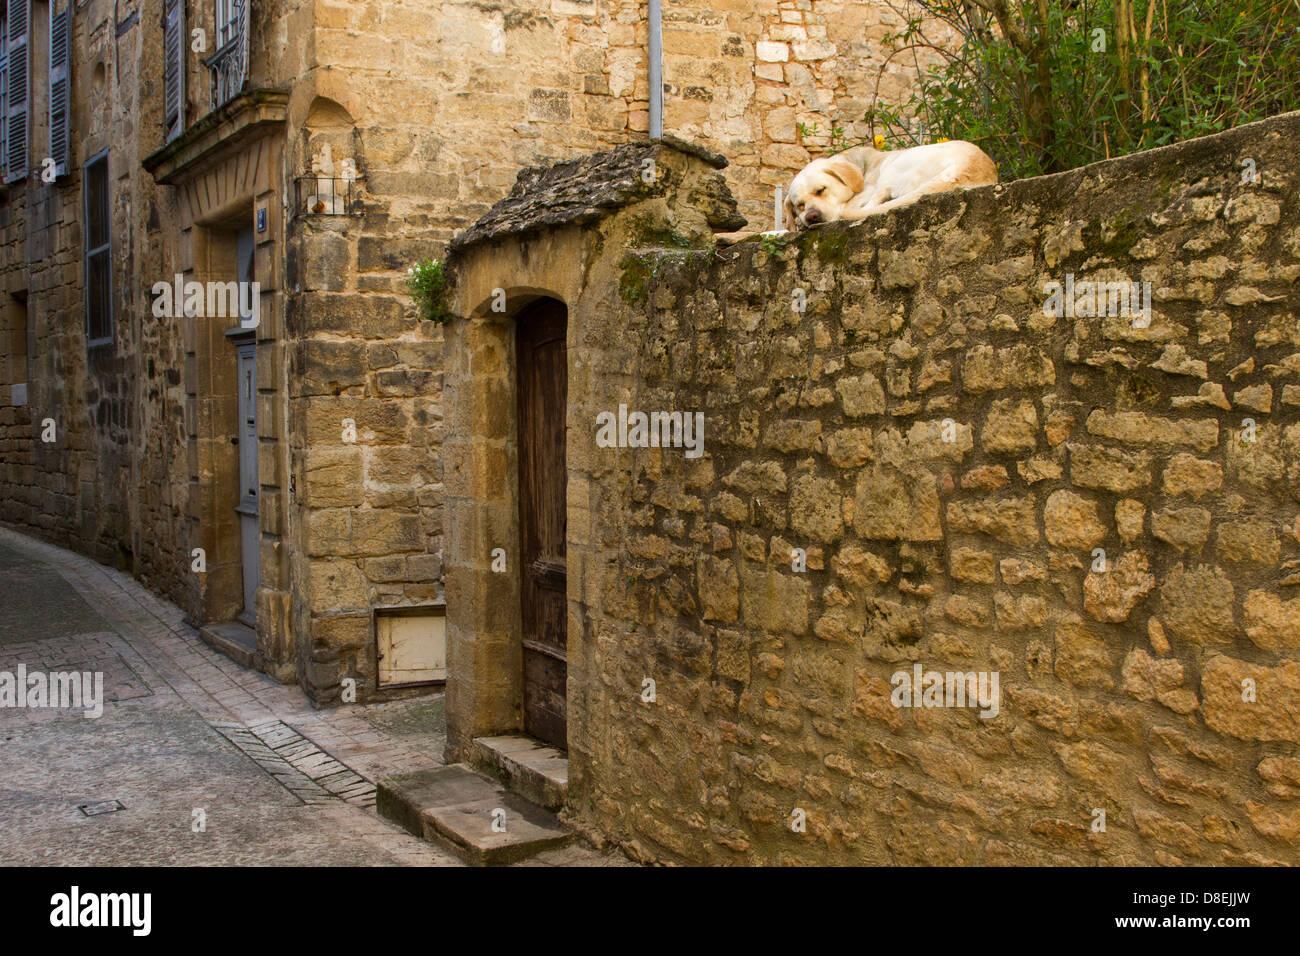 Labrador Retriever dog sleeping on old sandstone wall along a narrow cobblestone street, Sarlat, Dordogne region - Stock Image